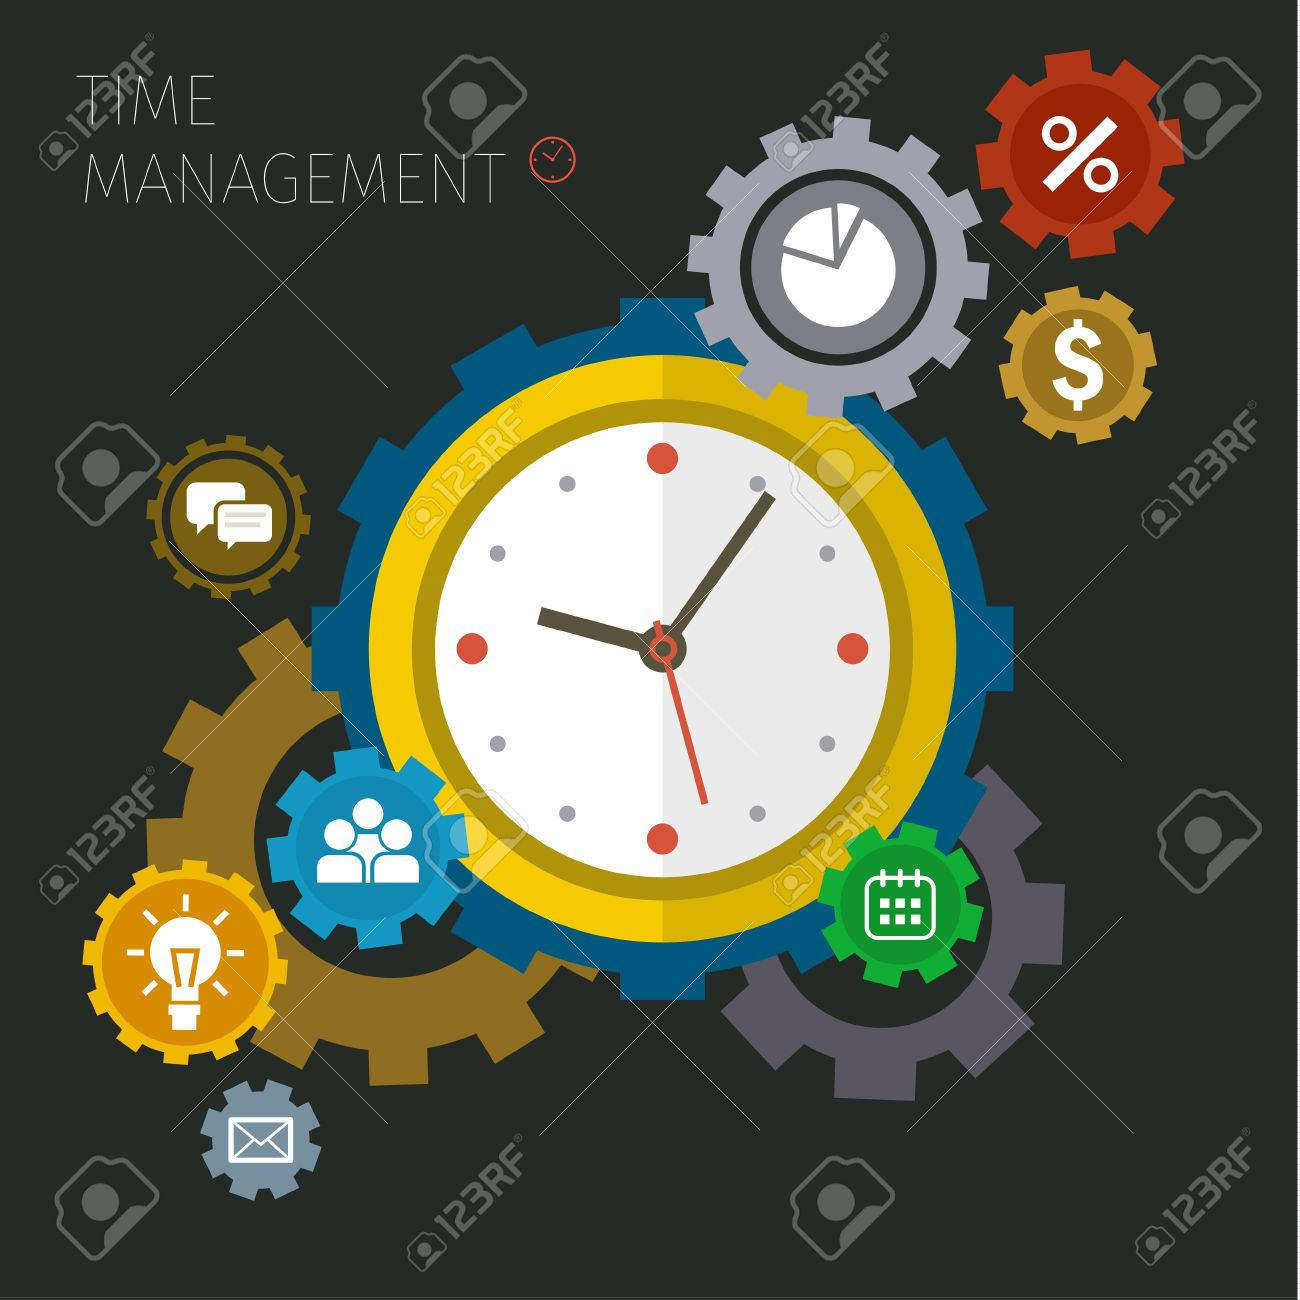 Flat design vector business illustration. Concept of effective time management. - 50857485